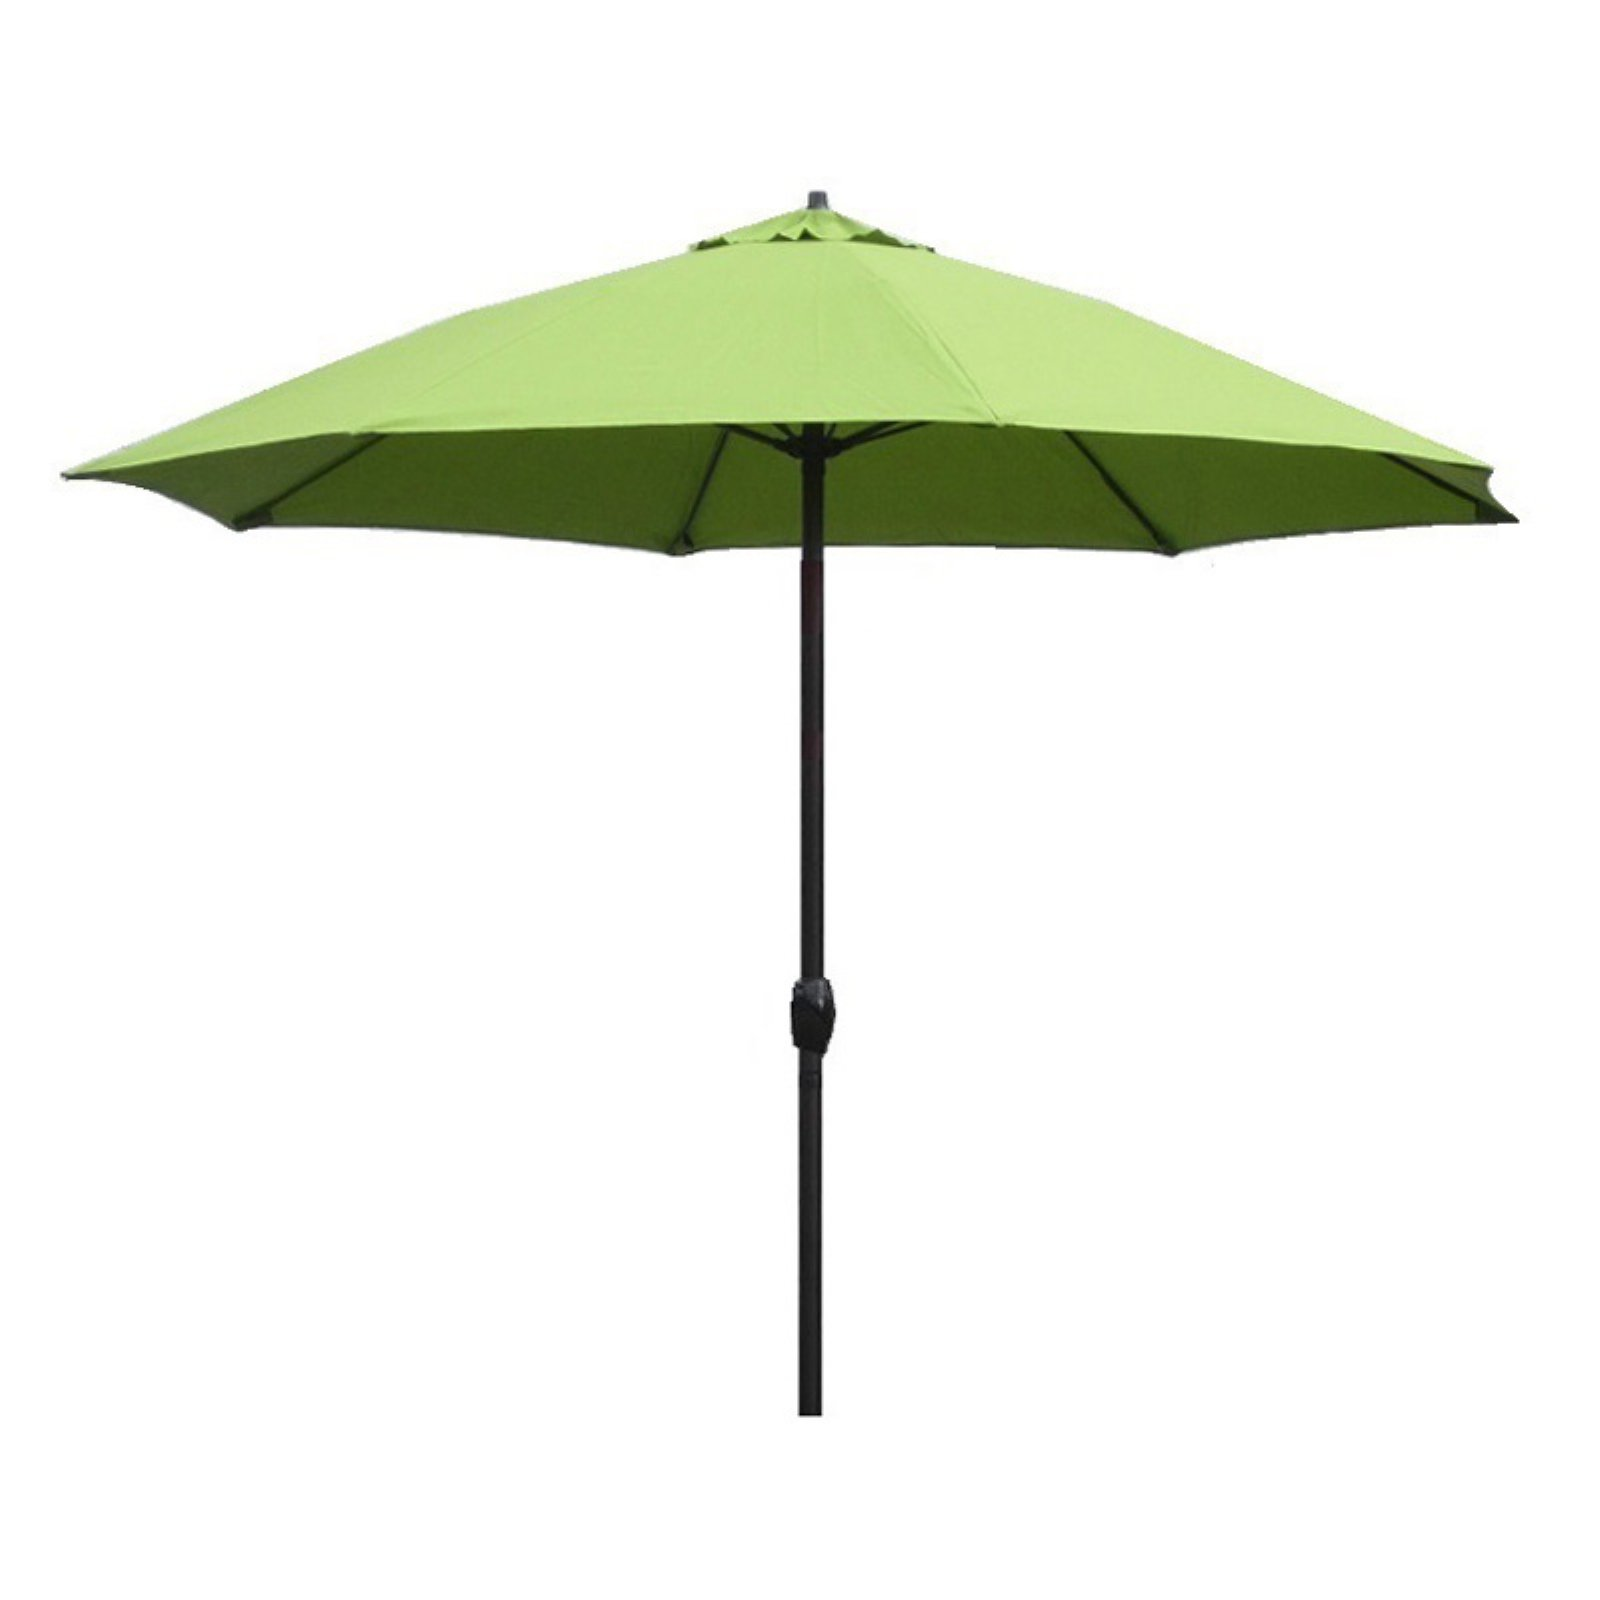 Lauren and Company 9' Navy Blue Aluminum Patio Umbrella by Lauren & Company